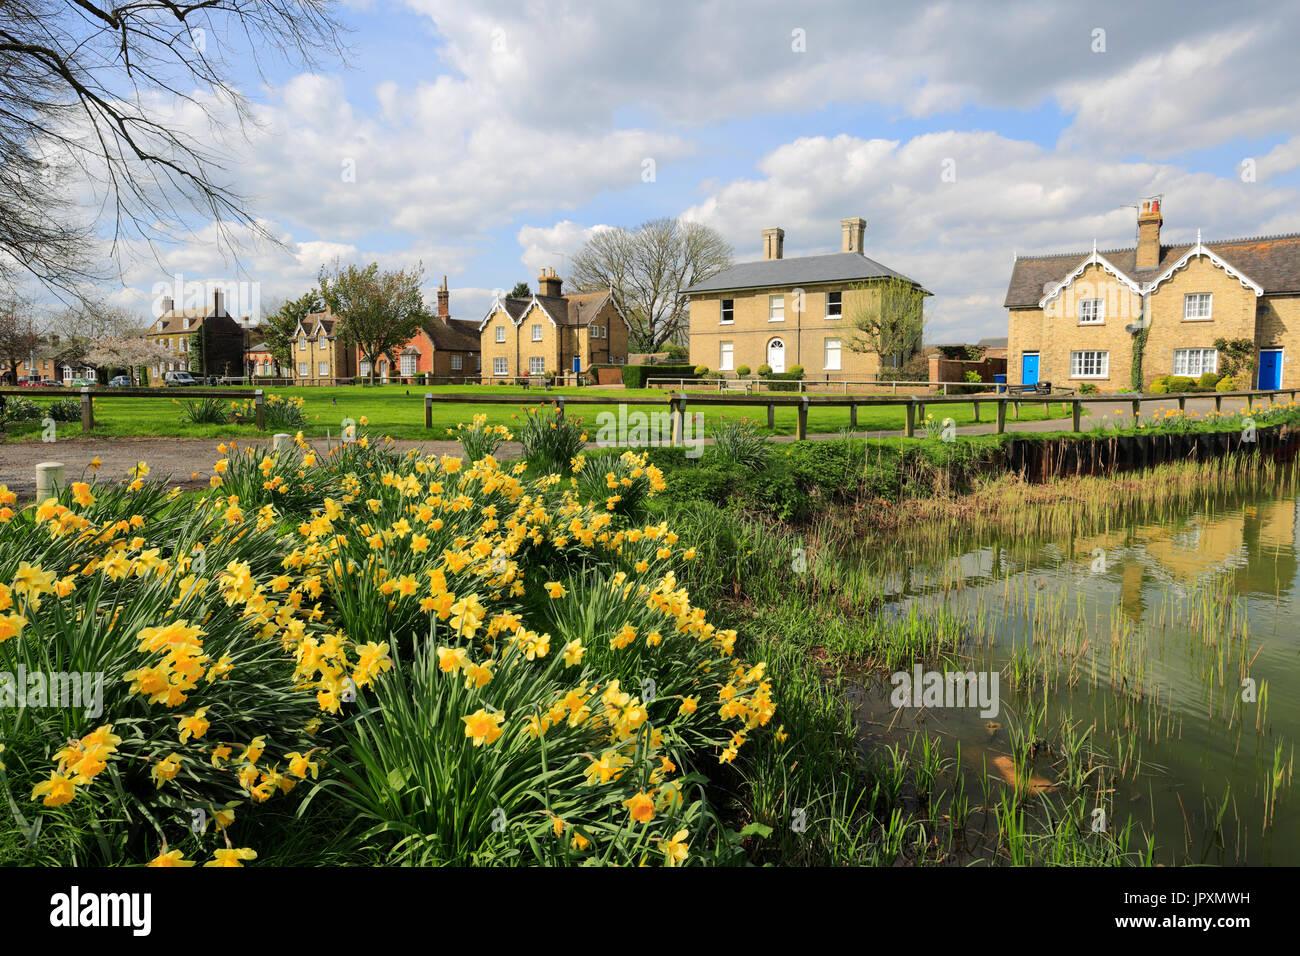 Spring daffodils along the village pond, Ramsey village; Cambridgeshire; England; UK - Stock Image